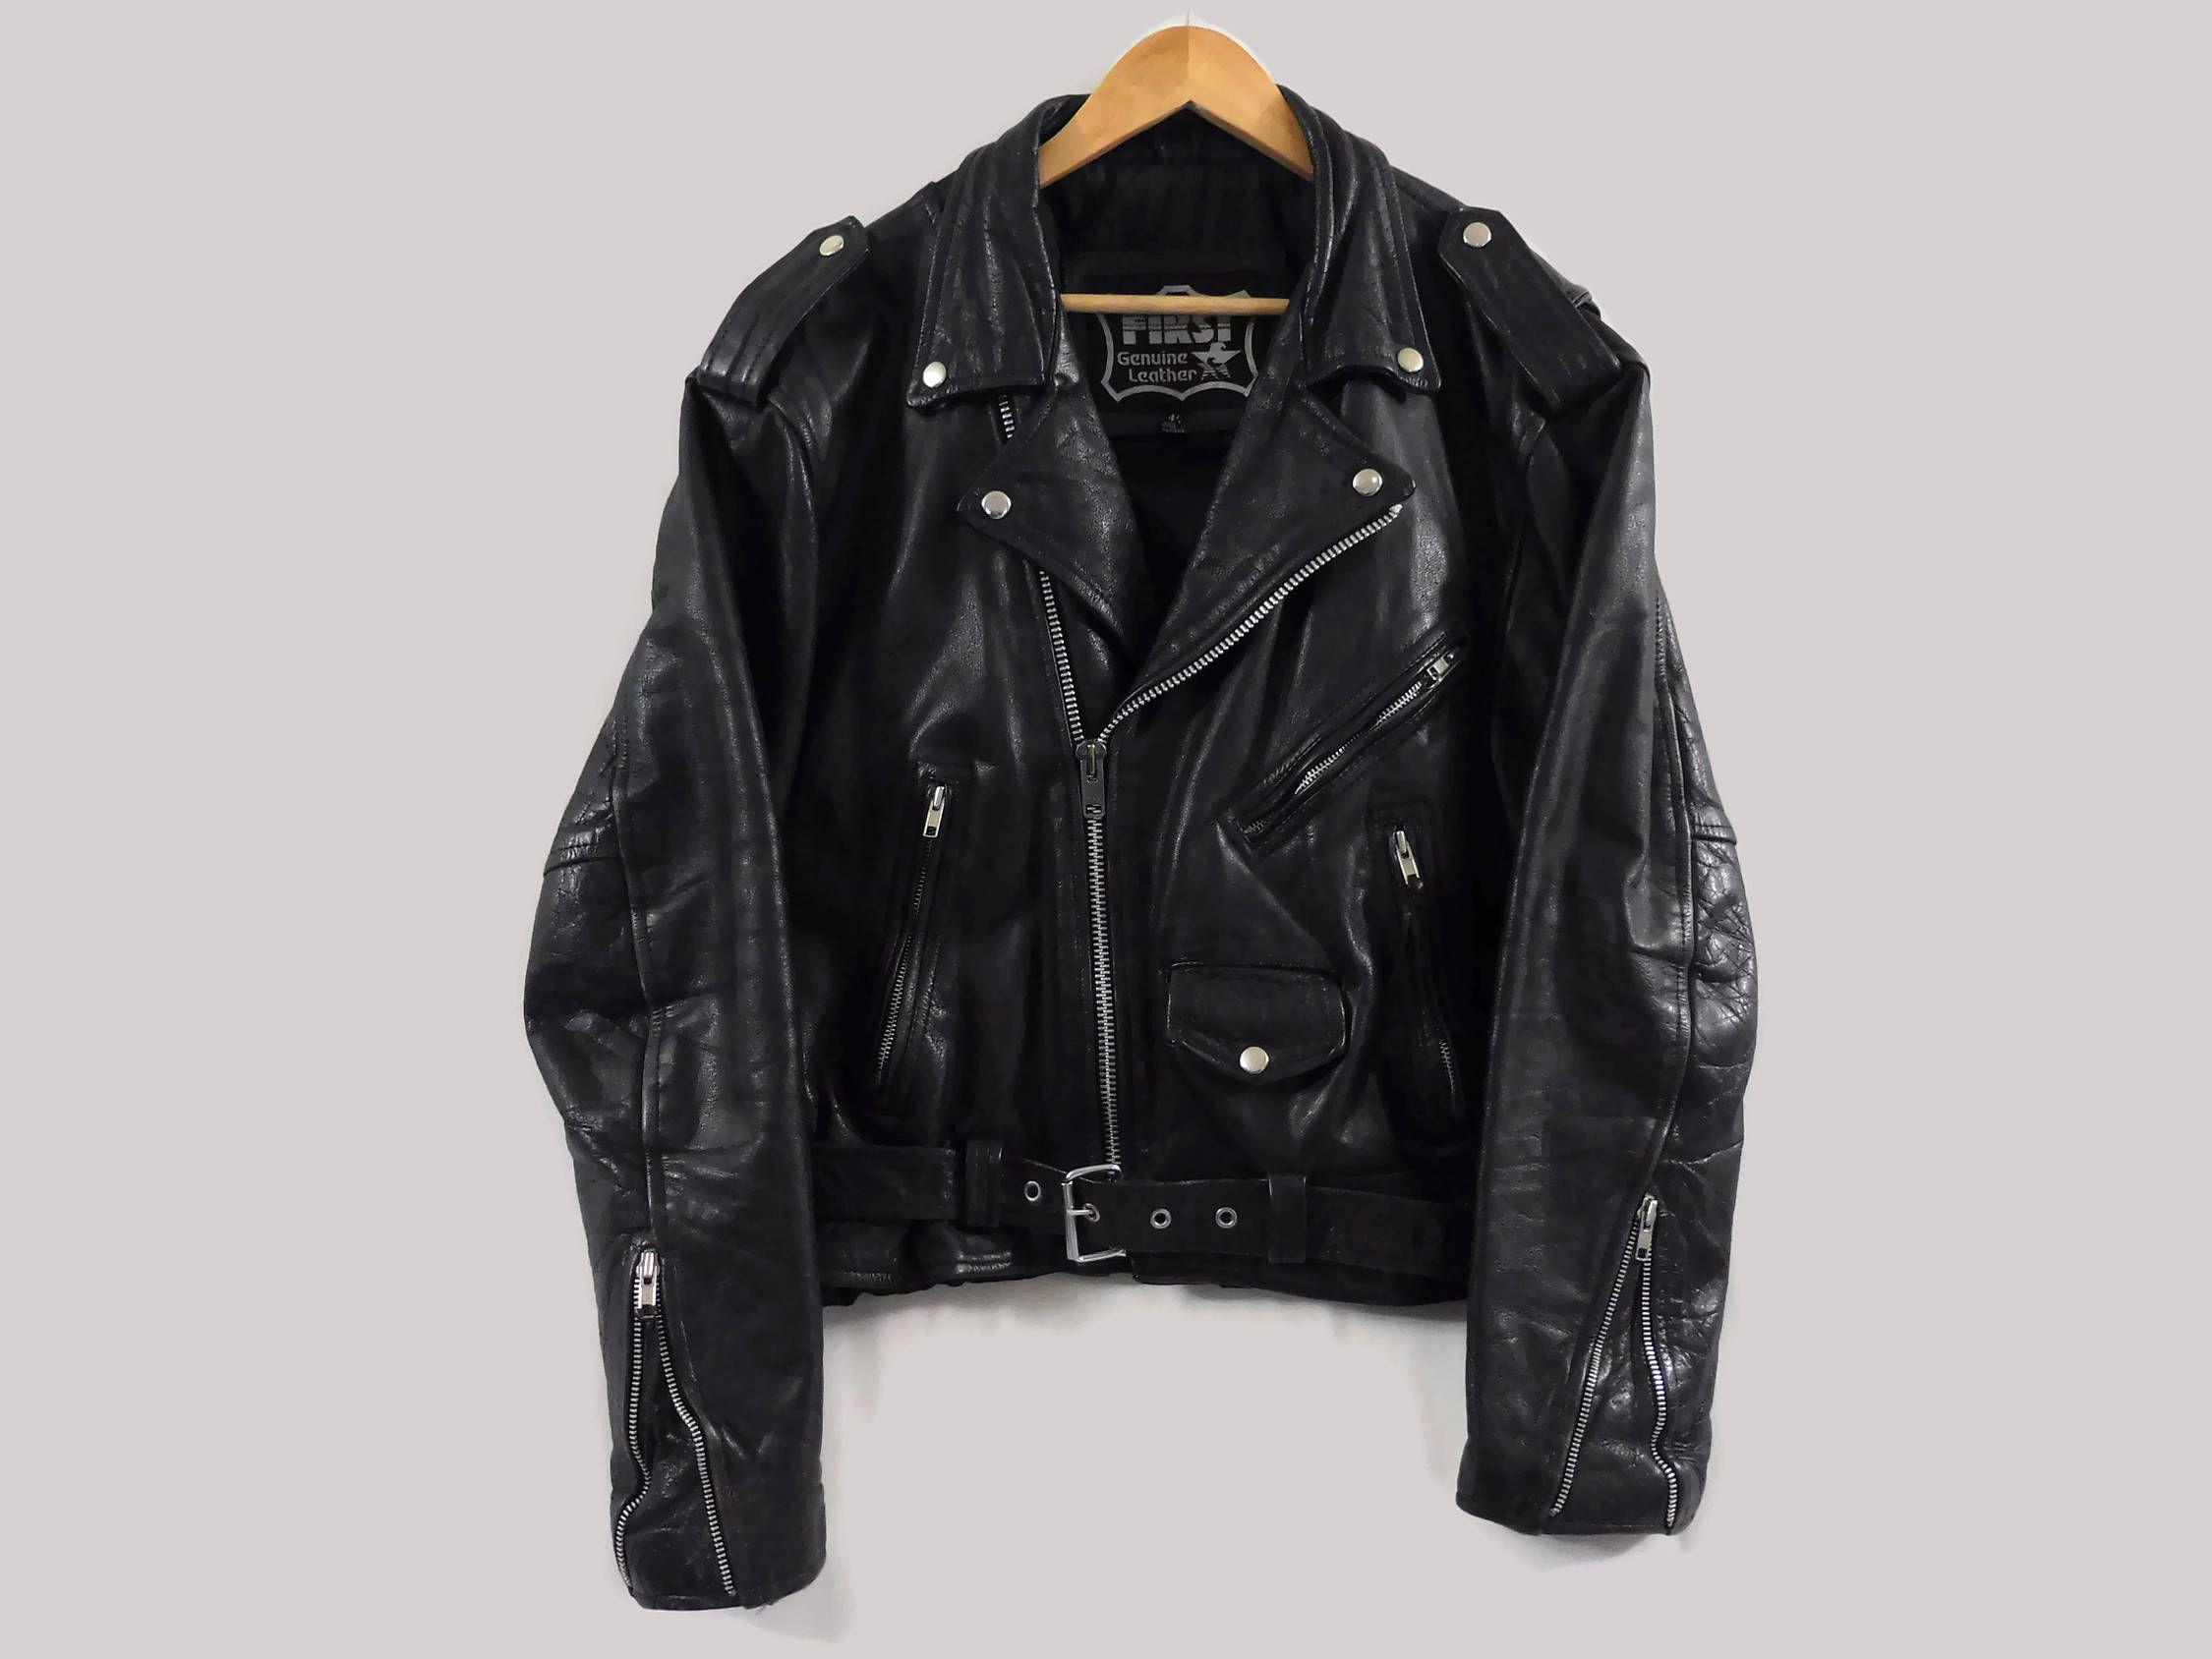 Vintage Black Leather Jacket Large First Leather